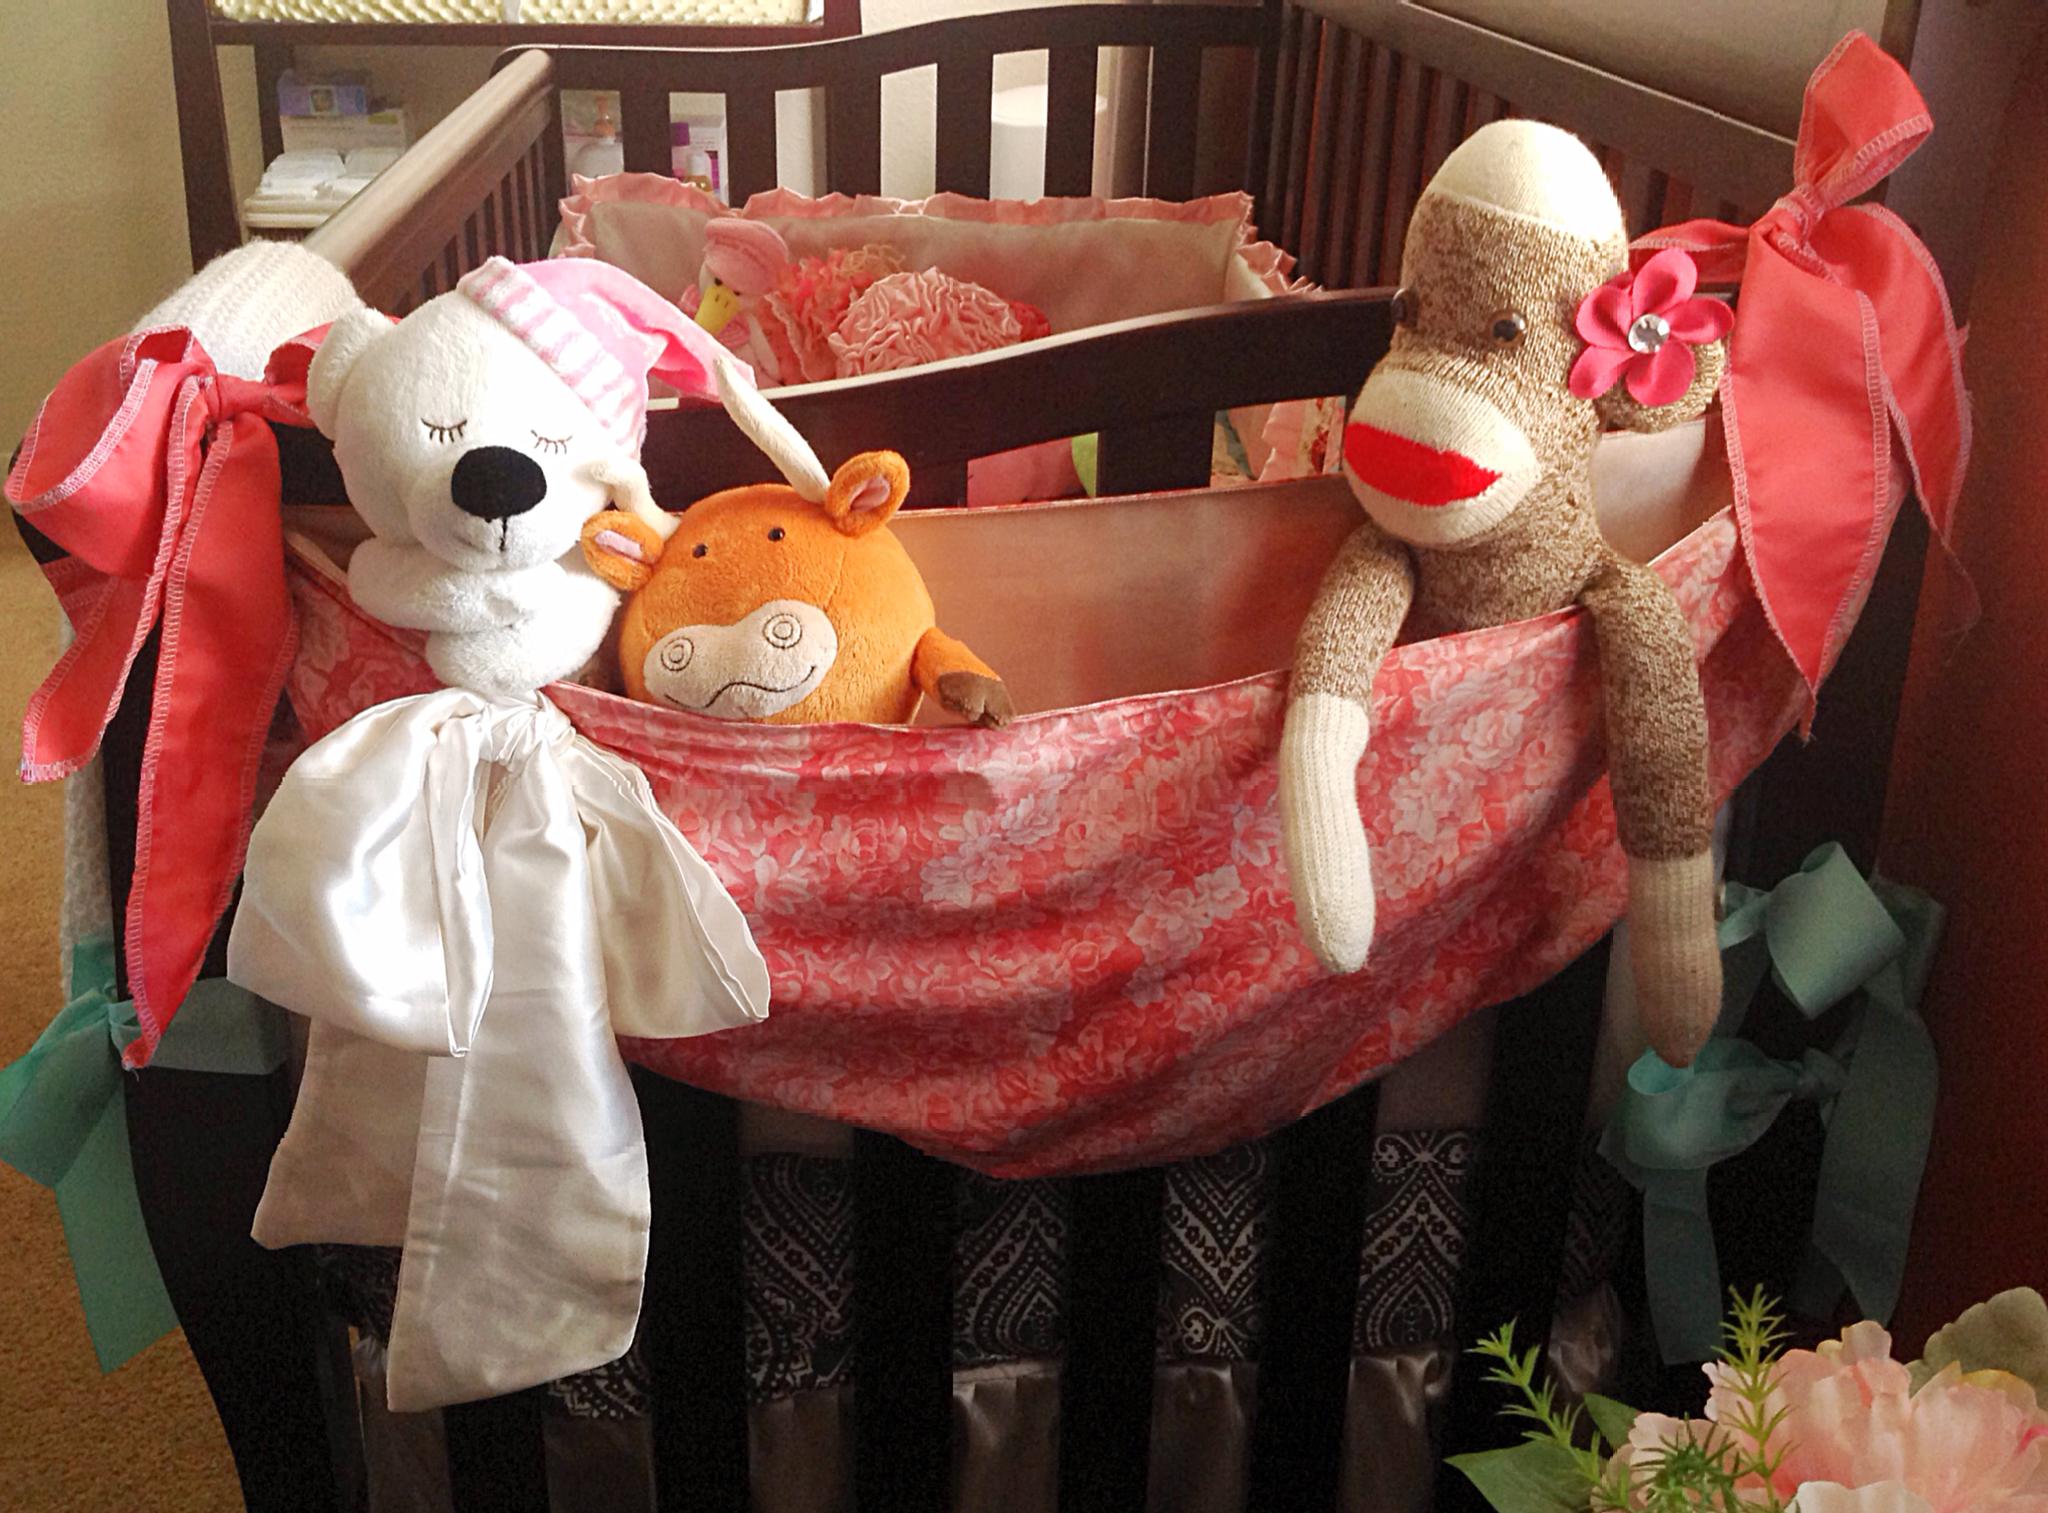 Toy/Storage Hammock & Sew Much More than Rubies: Toy/Storage Hammock